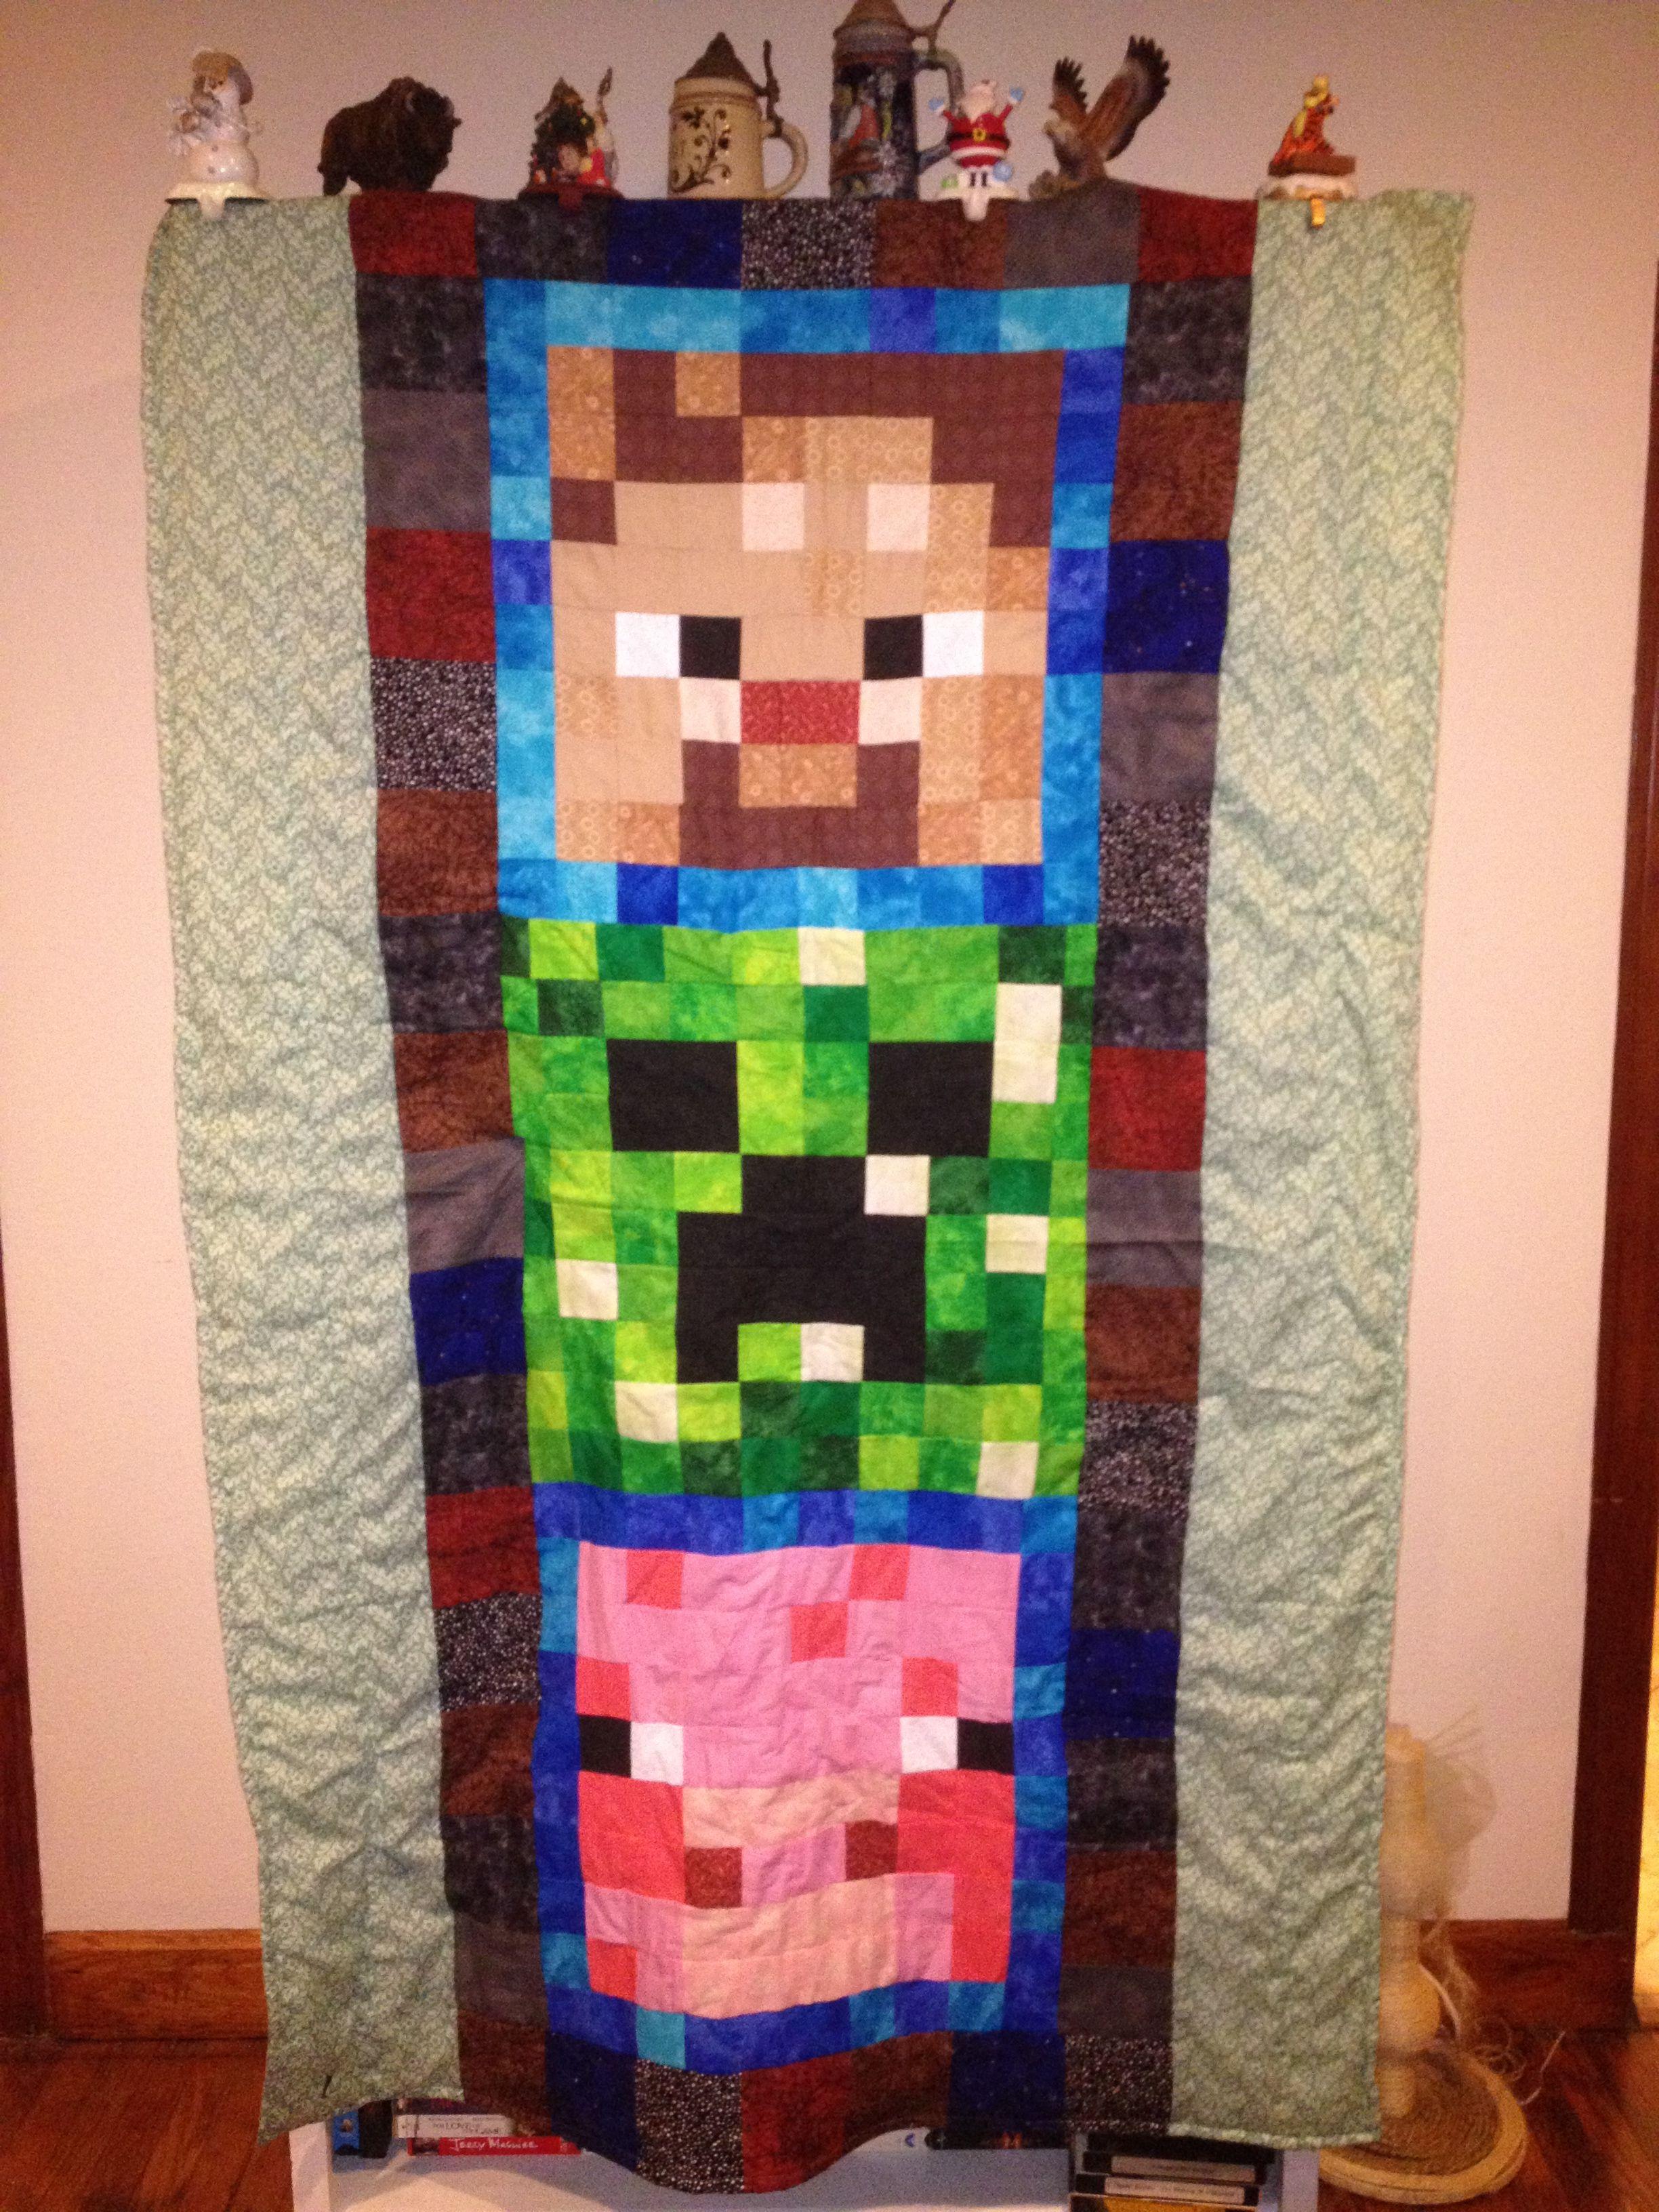 Pin by Janet Bergman on love it   Pinterest   Minecraft ... - photo#33